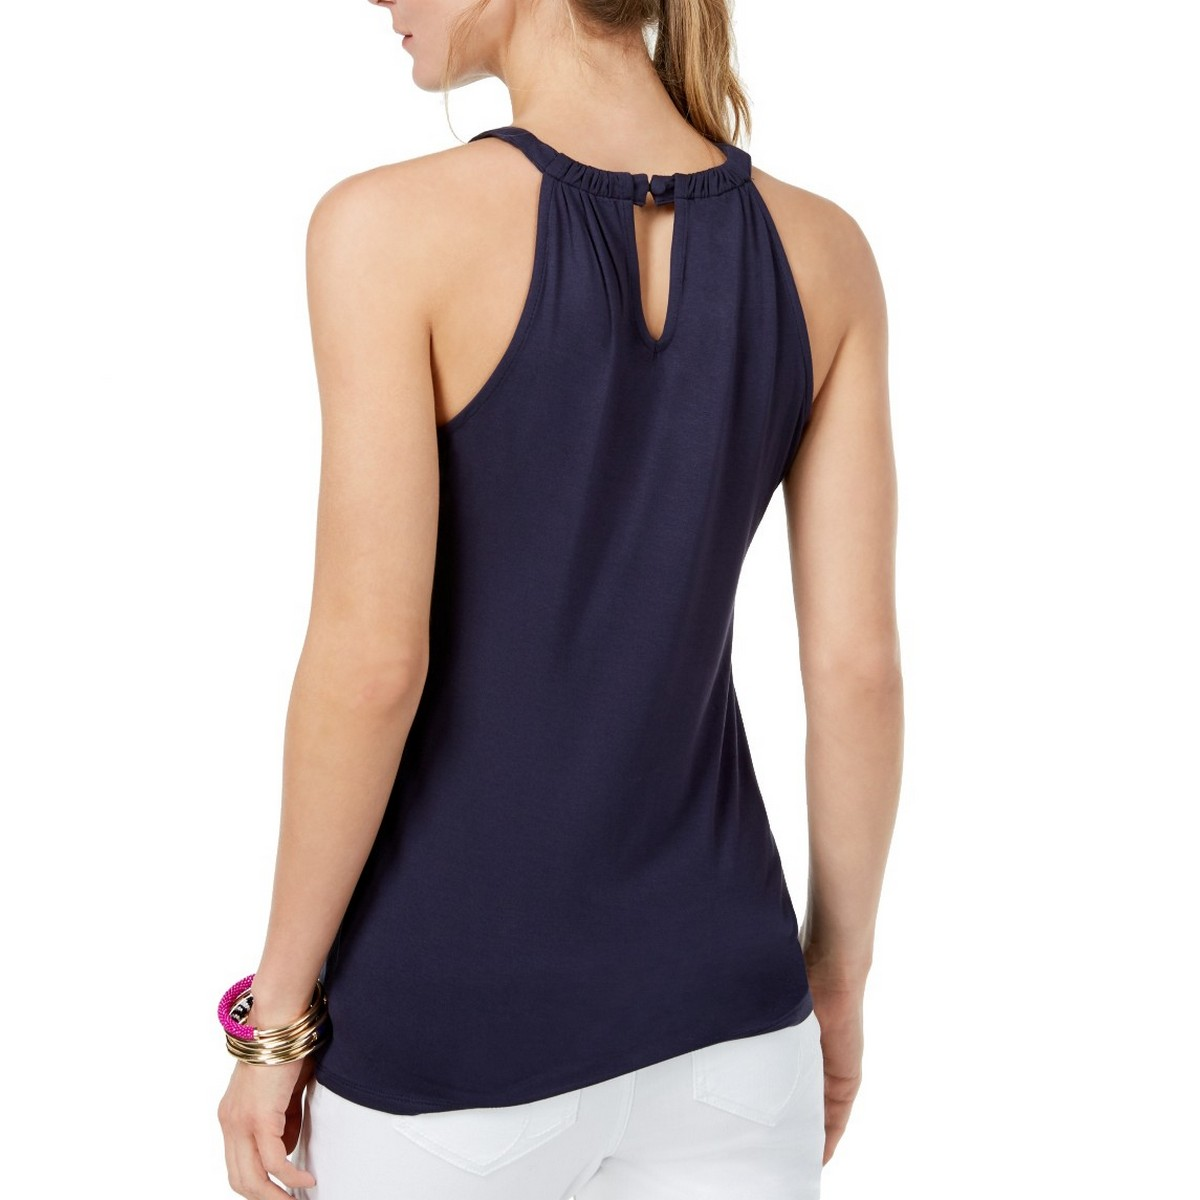 INC-NEW-Women-039-s-Sleeveless-Illusion-Halter-Blouse-Shirt-Top-TEDO thumbnail 4